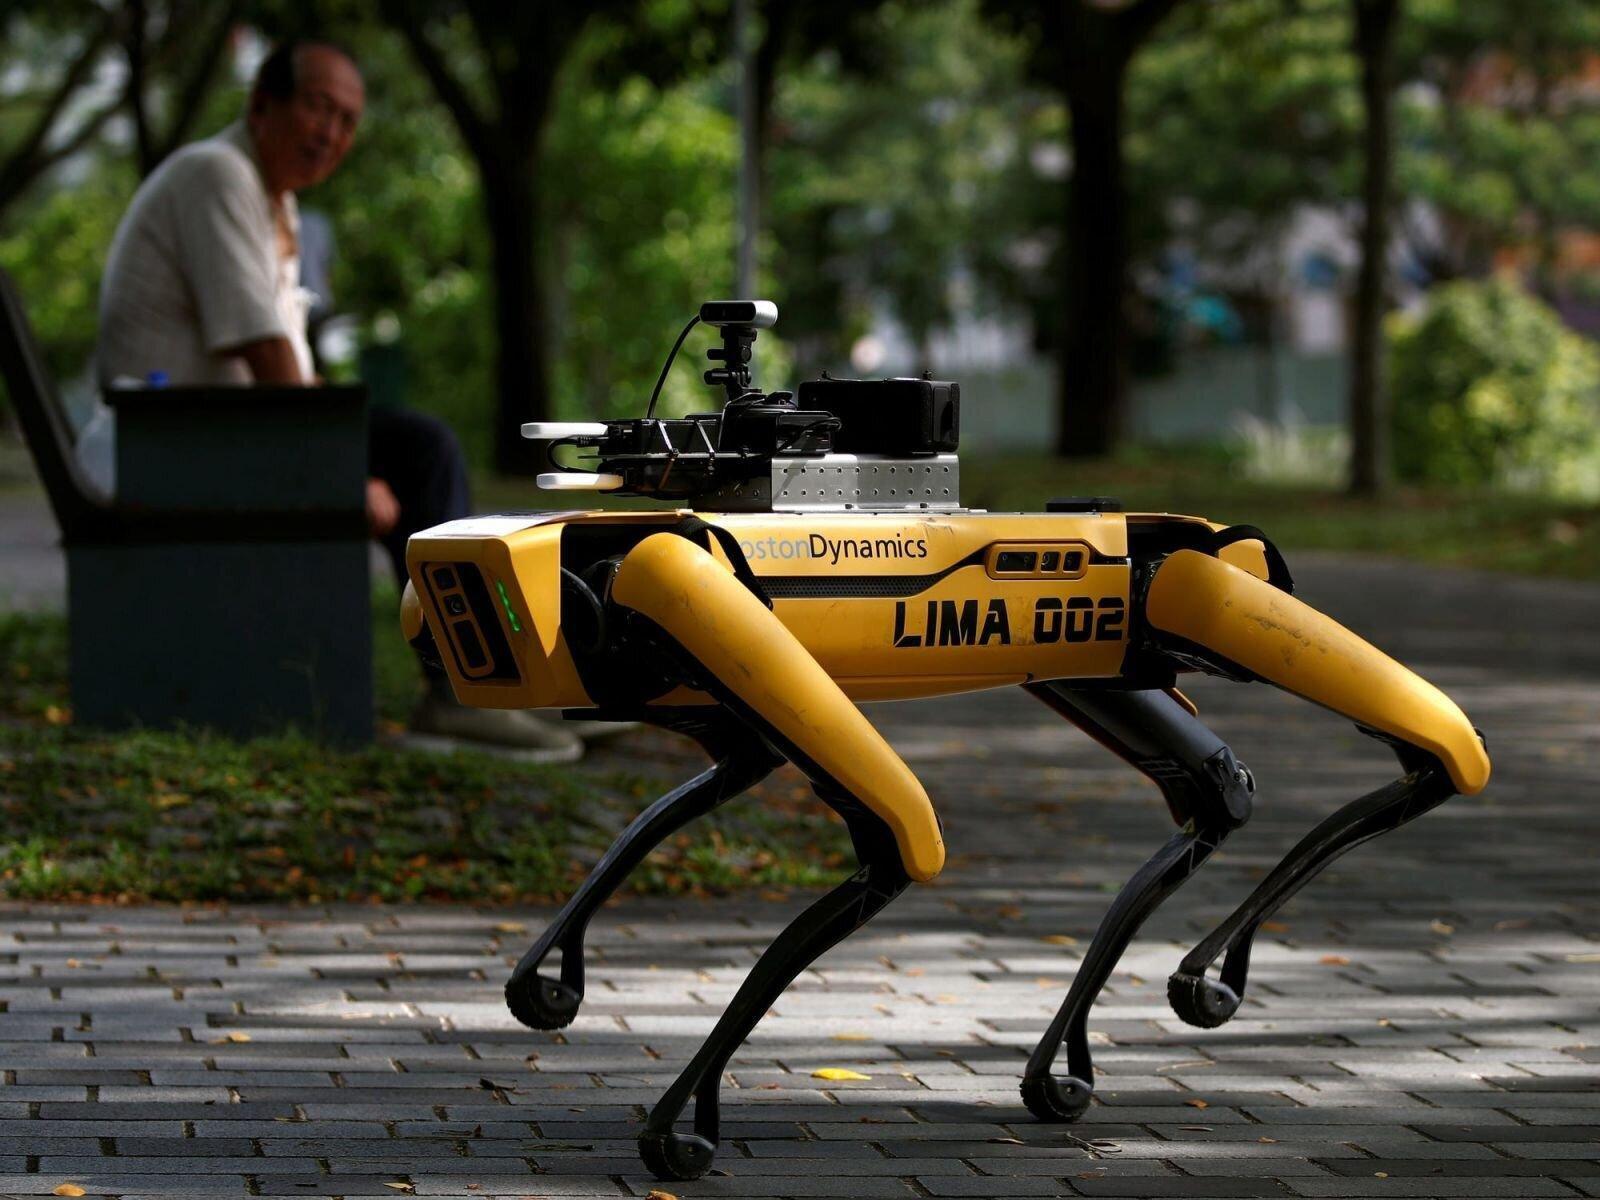 Hyundai Has Bought Robot Maker Boston Dynamics From SoftBank in a $1.1 Billion Deal